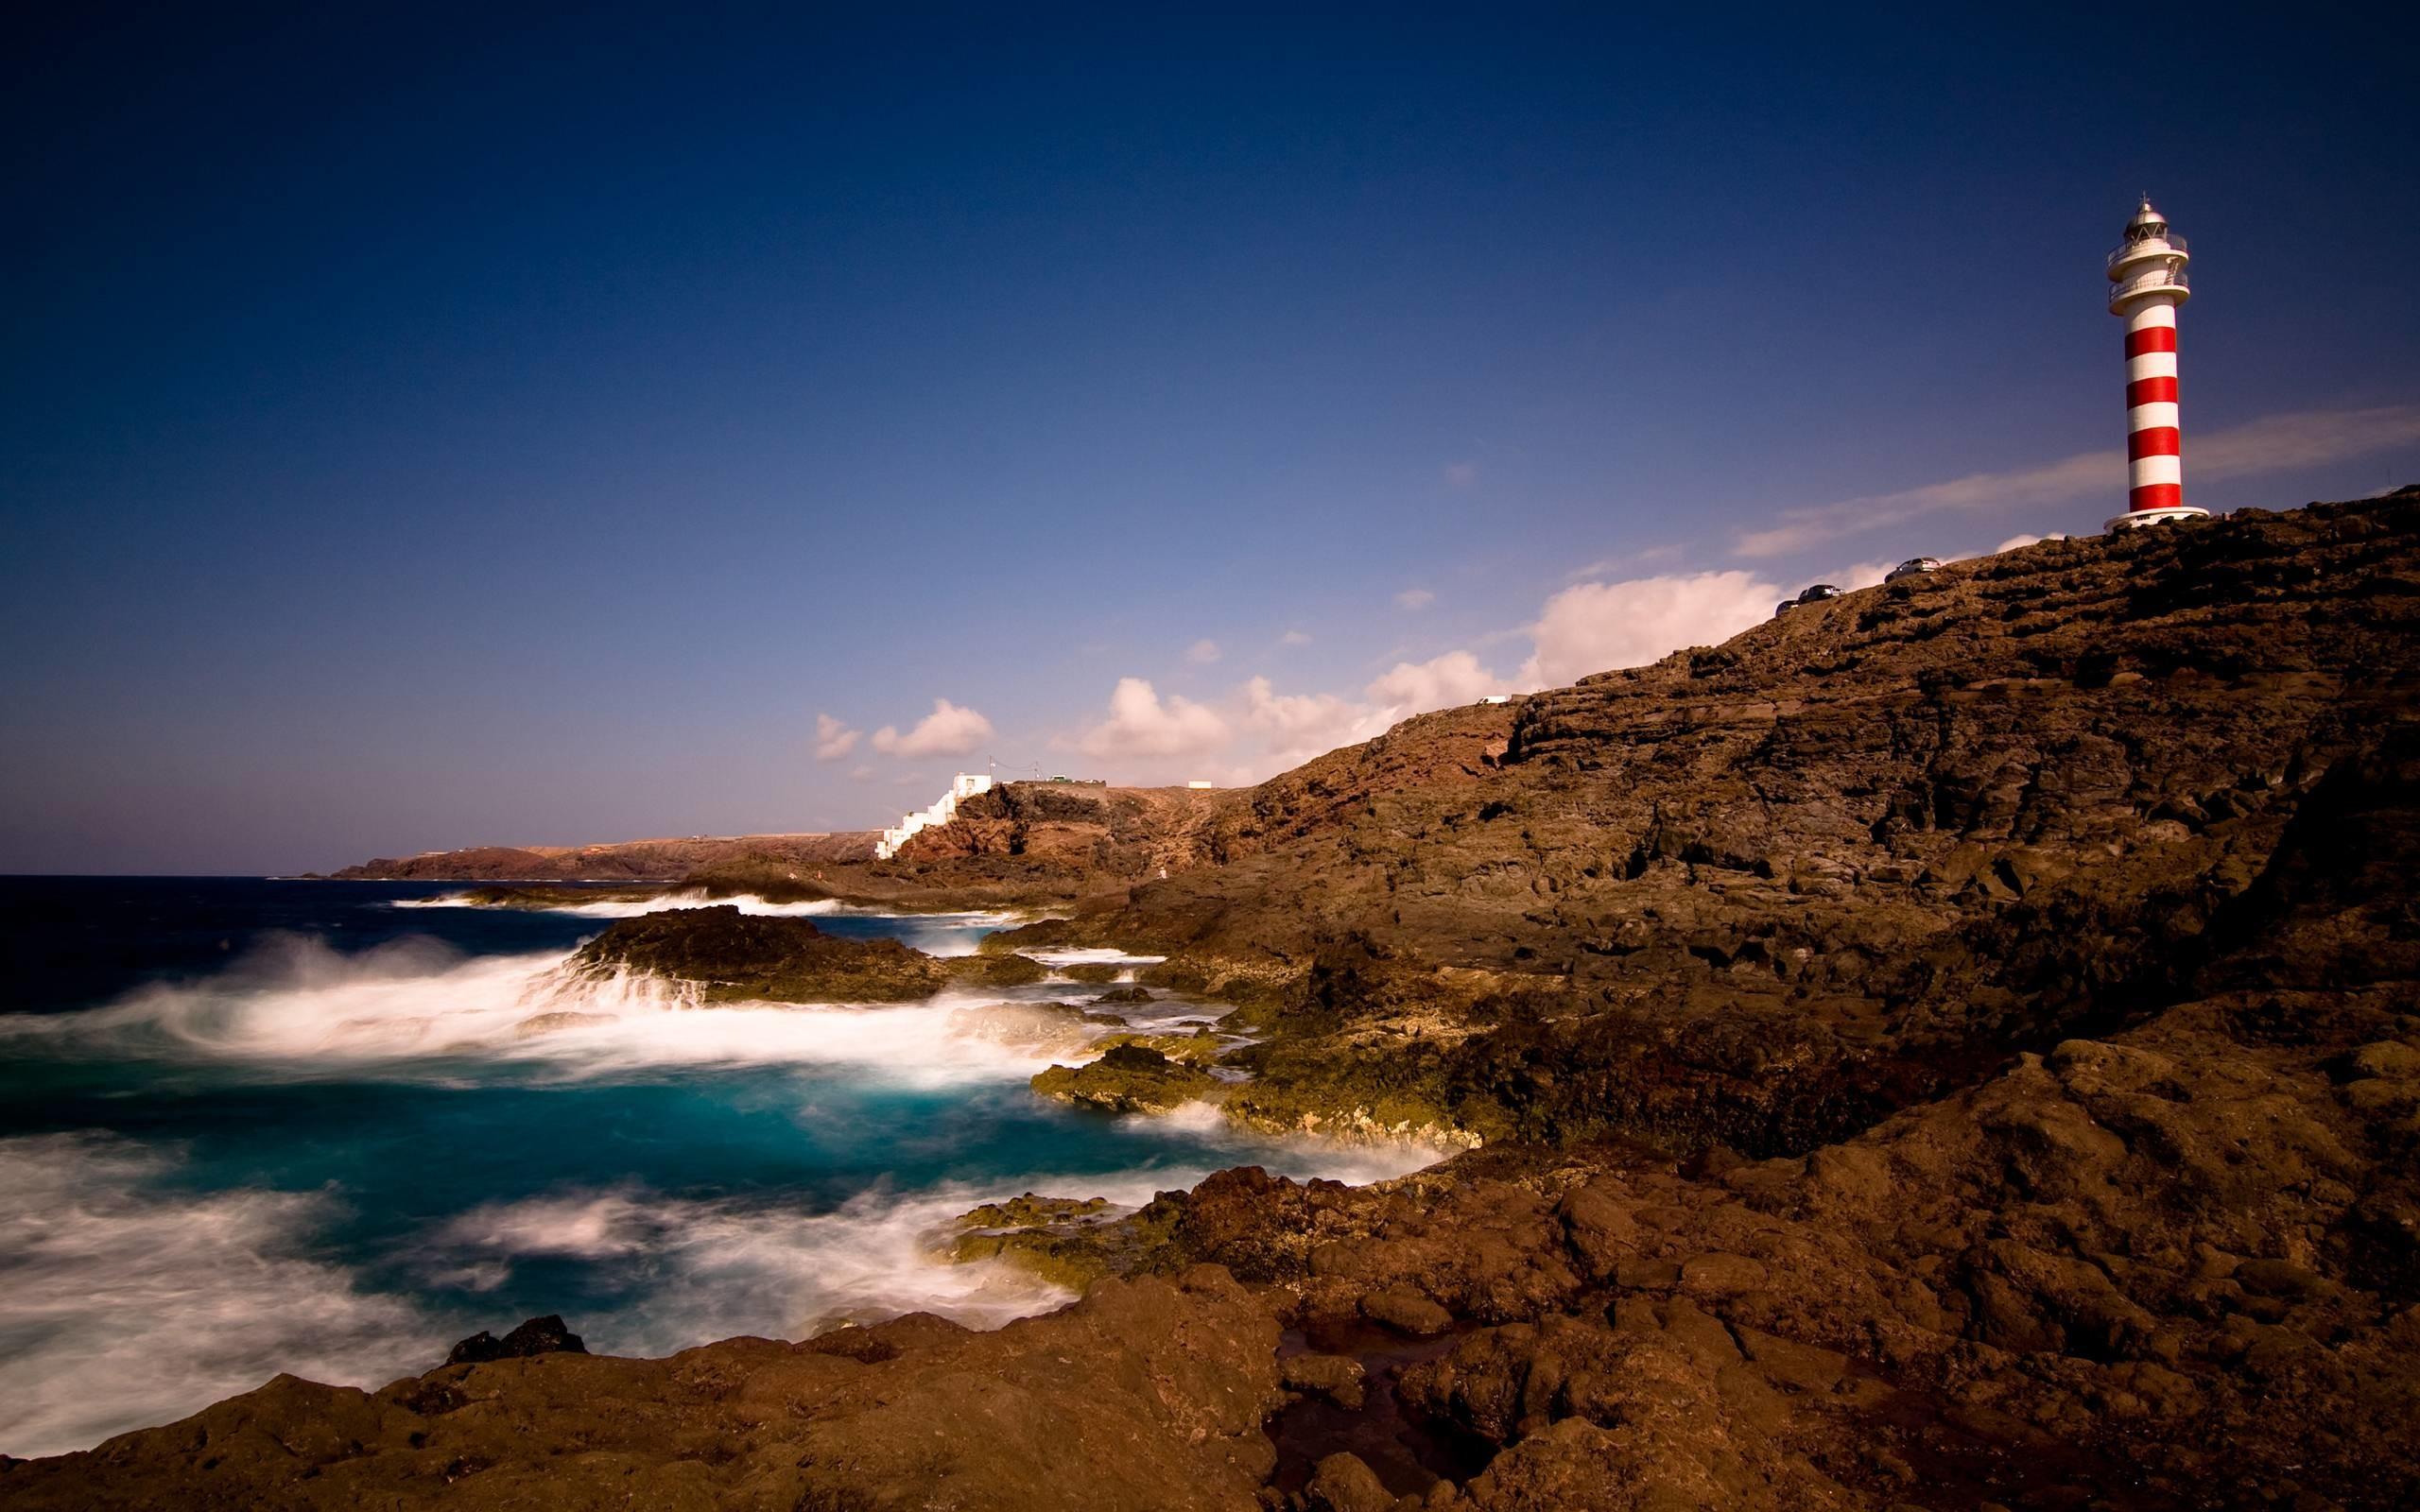 природа маяк море скалы  № 2238531 без смс